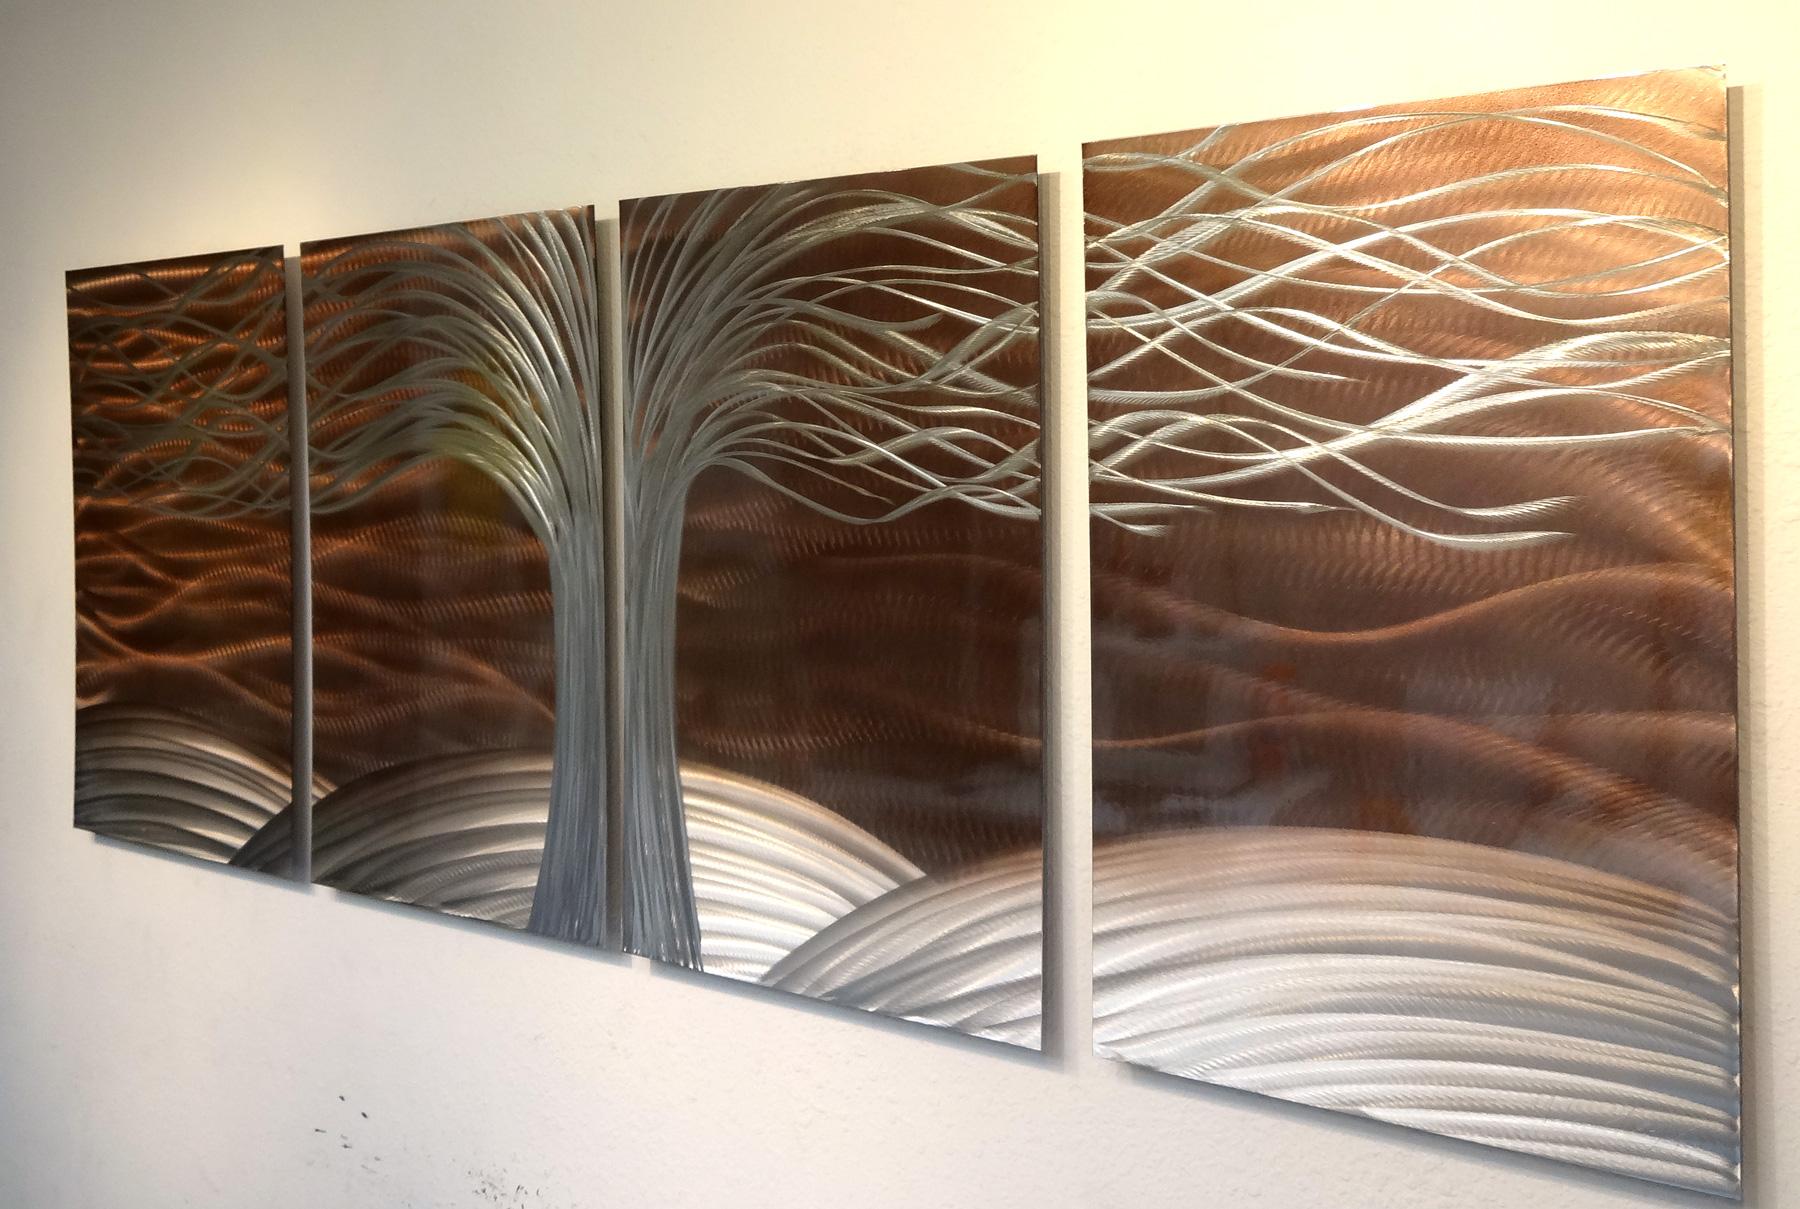 Metal Tree Wall Art Gallery: Tree Of Life Burnt Copper- Metal Wall Art Abstract